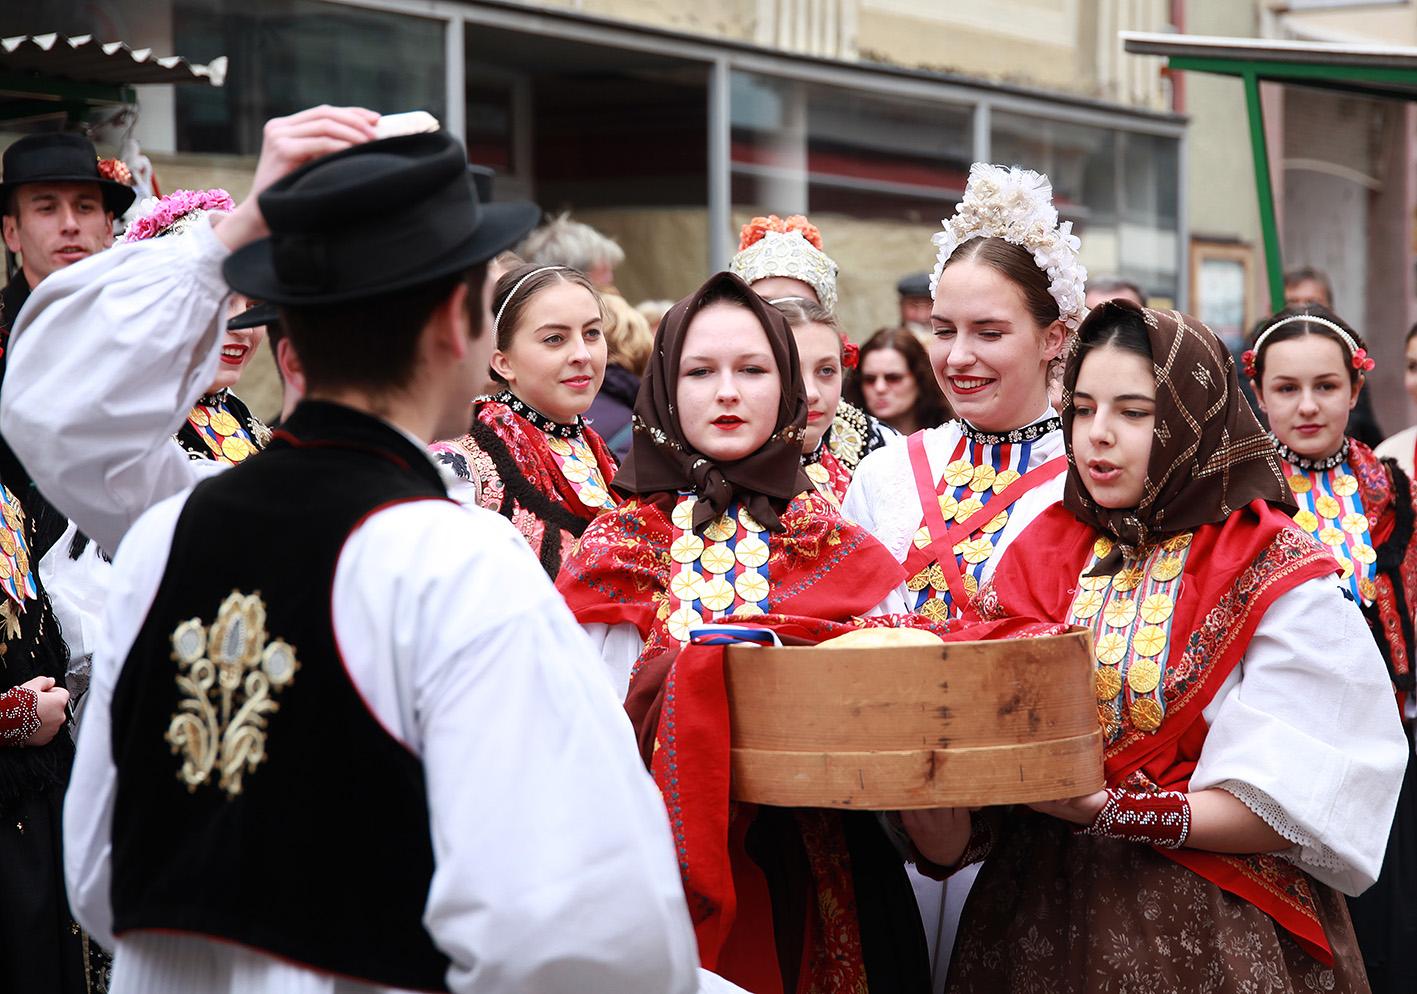 Uskrsni gastro fest u Đakovu